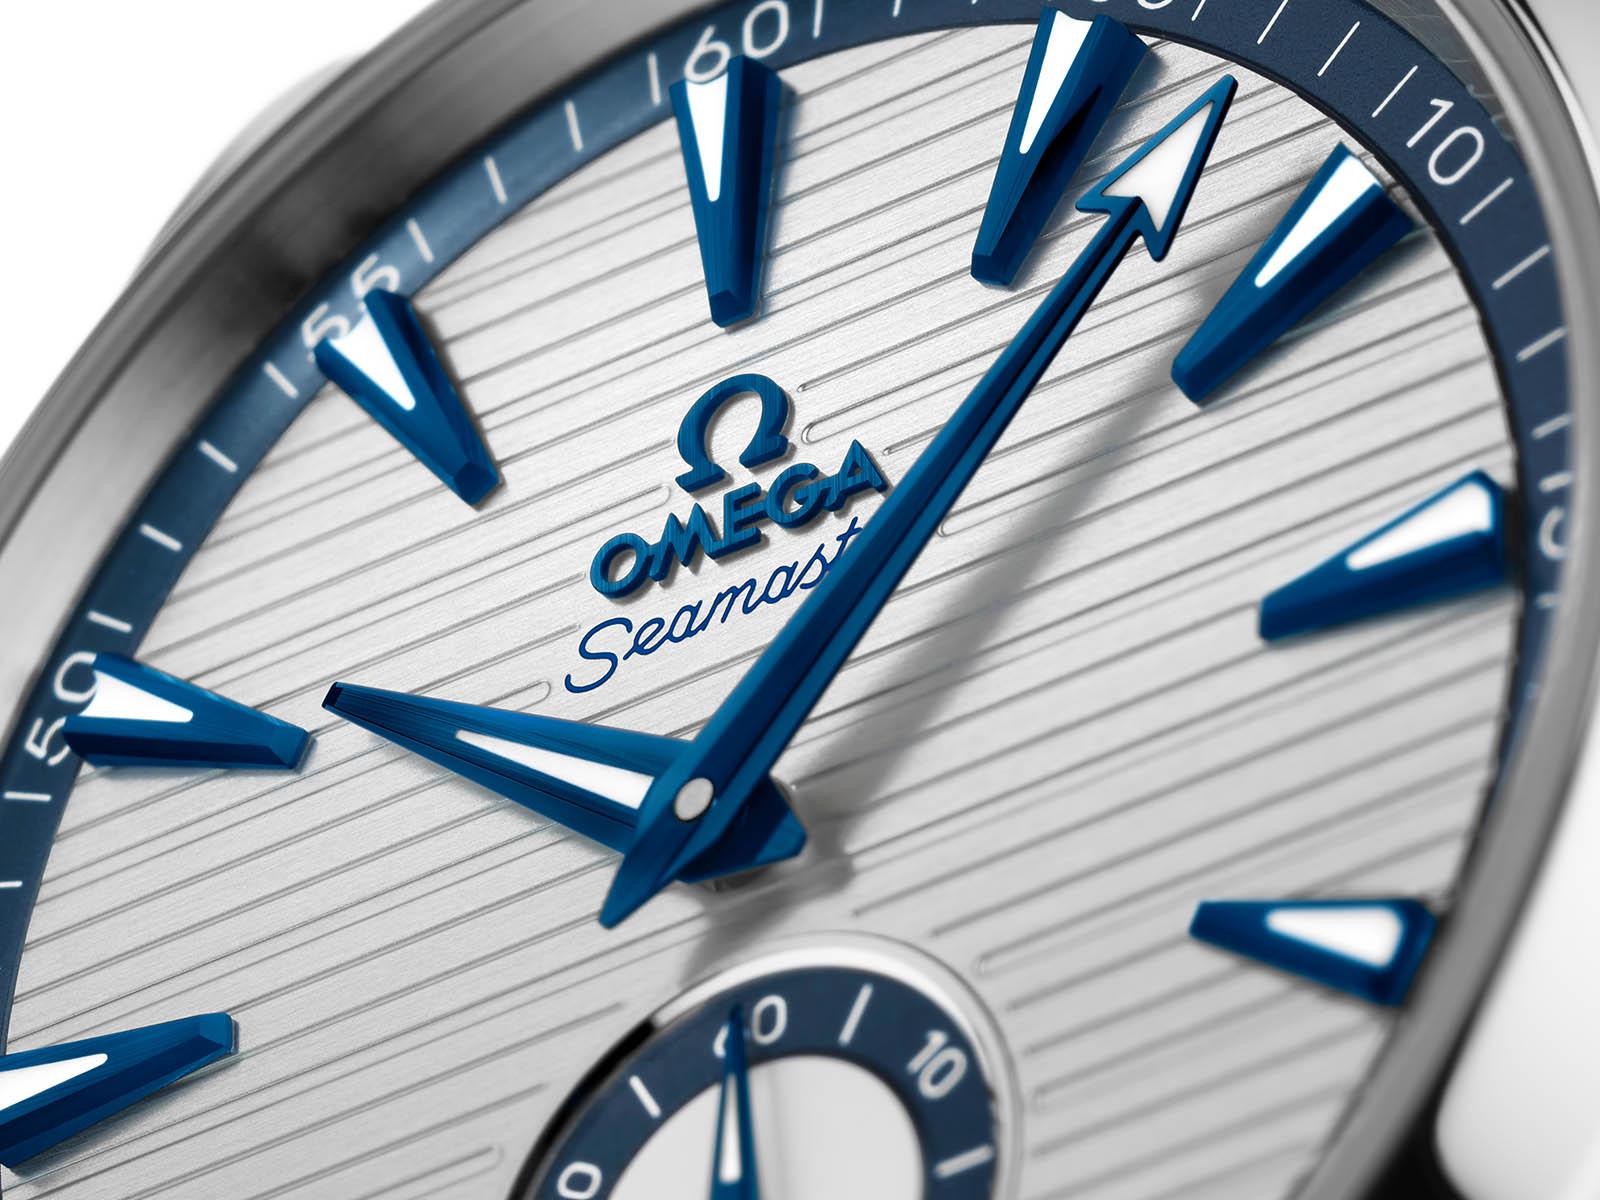 220-10-41-21-02-004-omega-seamaster-aqua-terra-150m-2.jpg